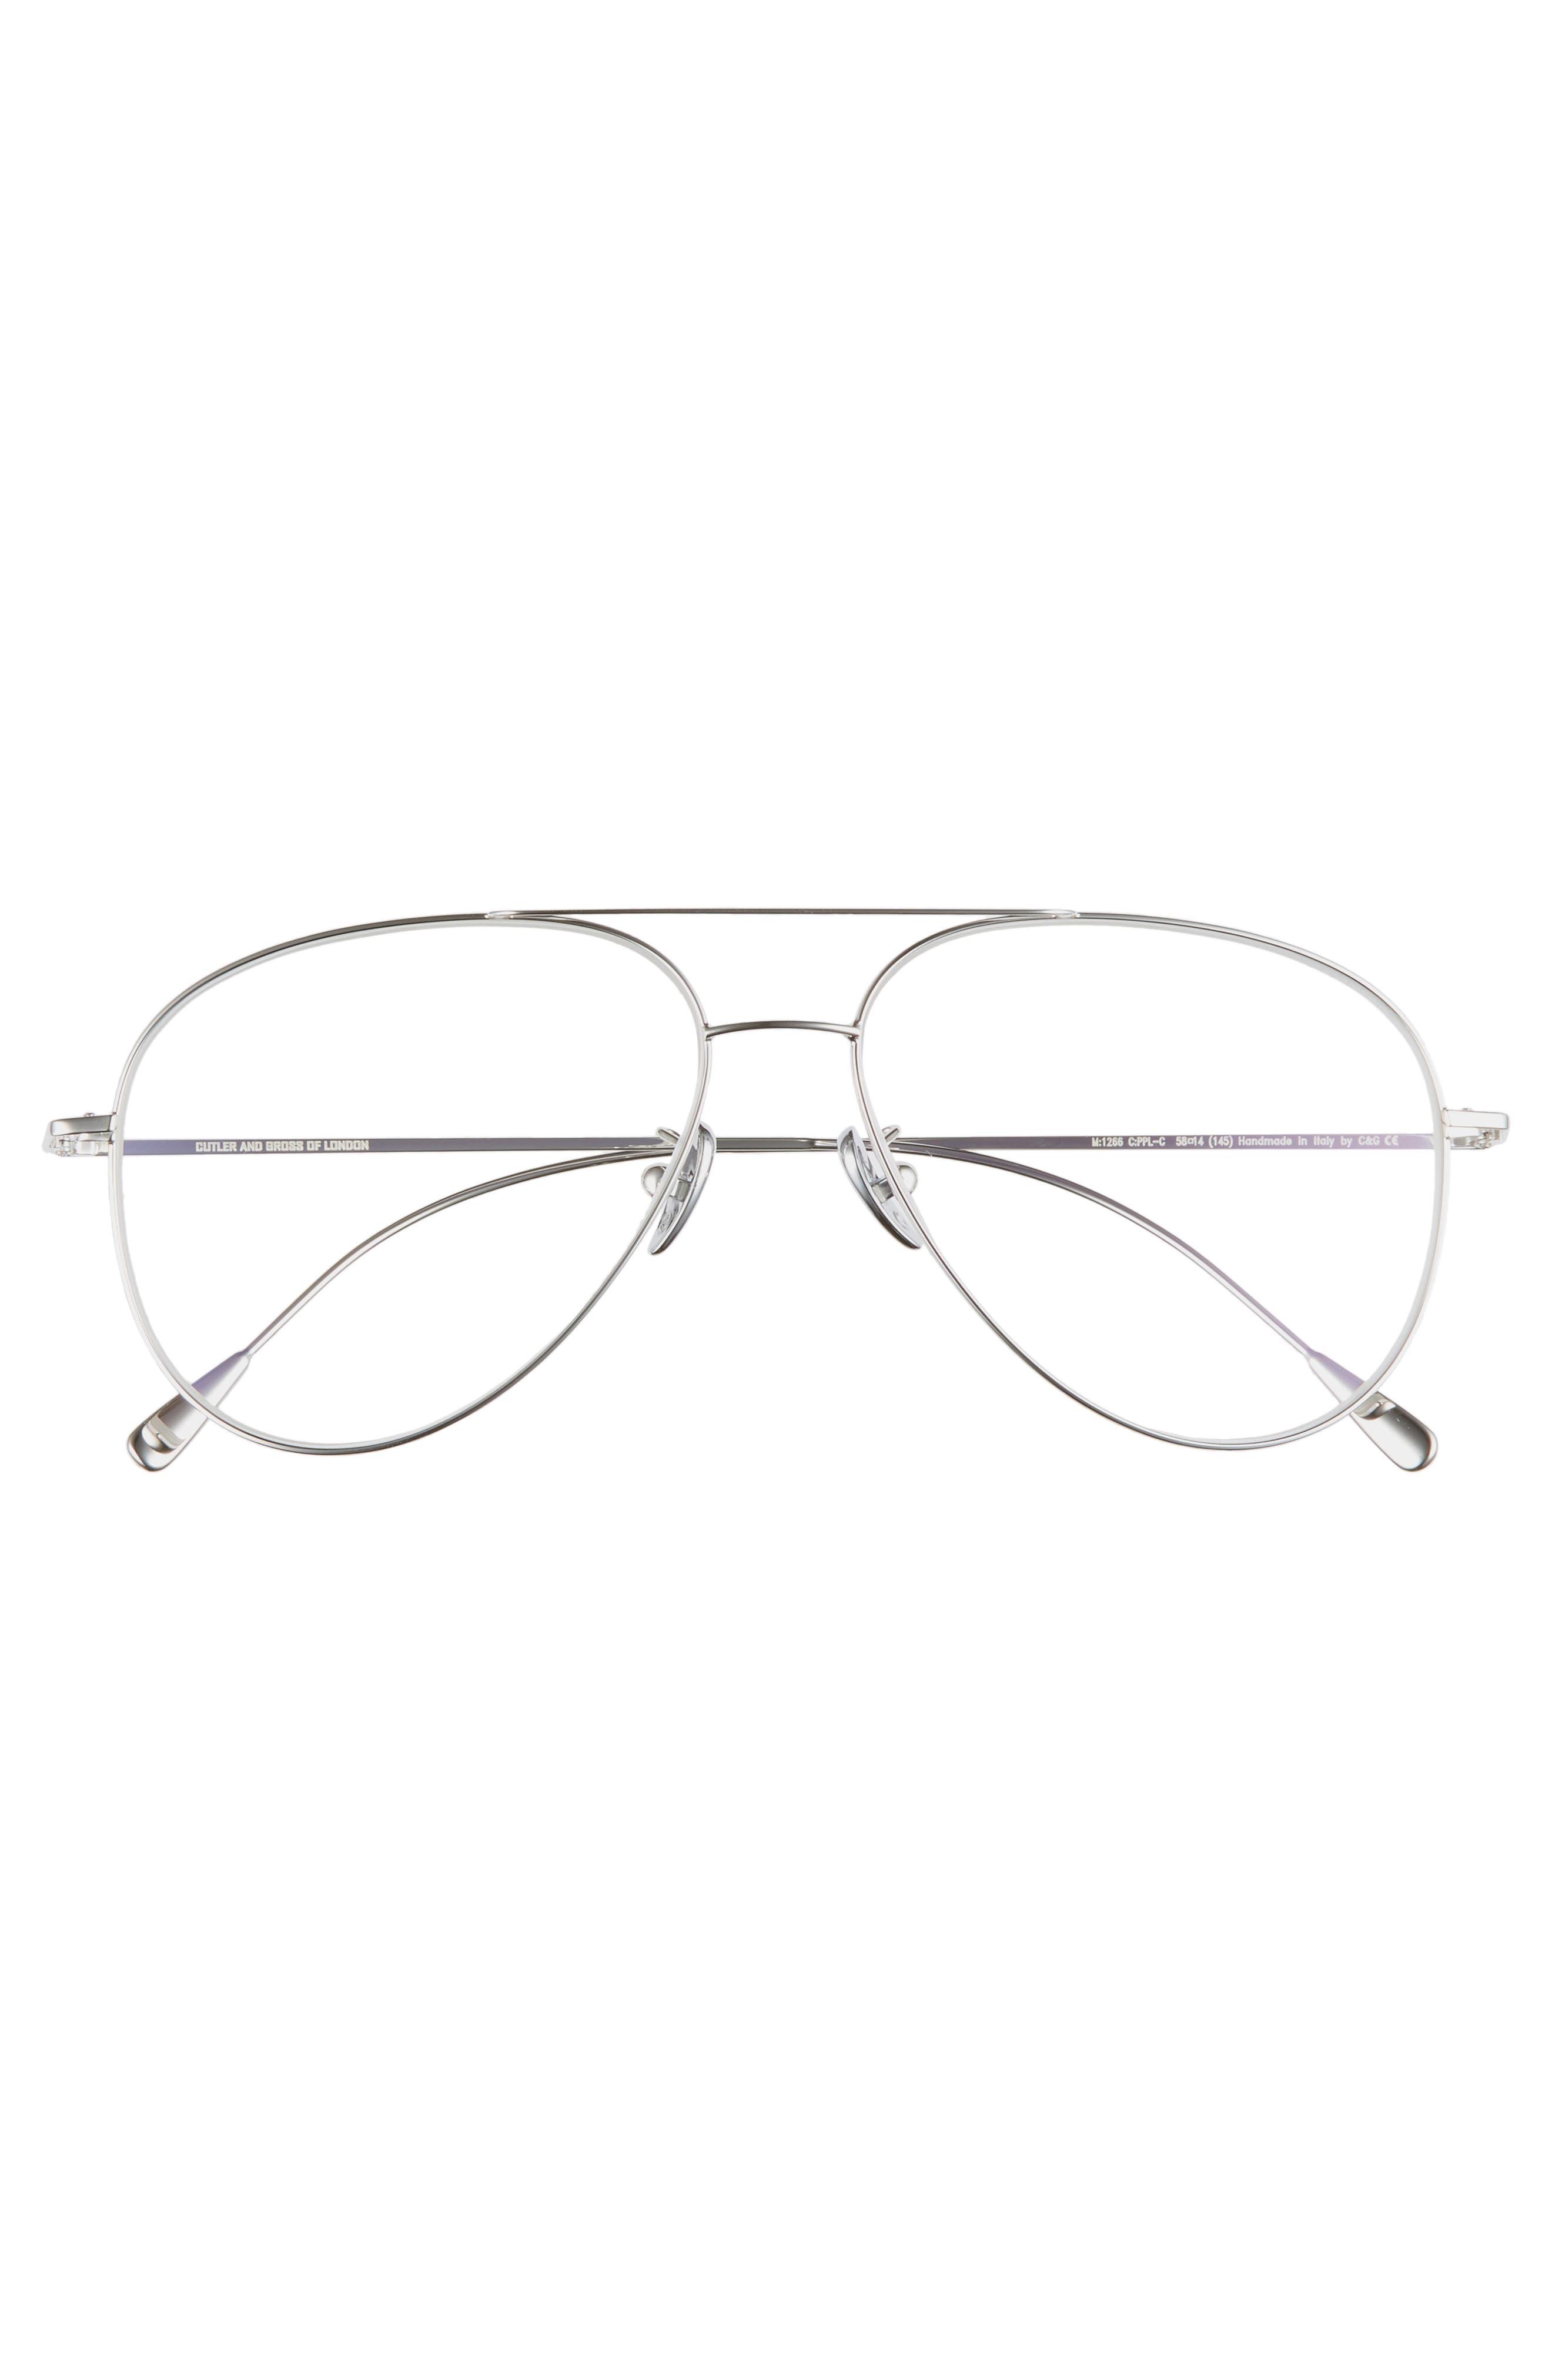 58mm Polarized Aviator Optical Glasses,                             Alternate thumbnail 2, color,                             PALLADIUM